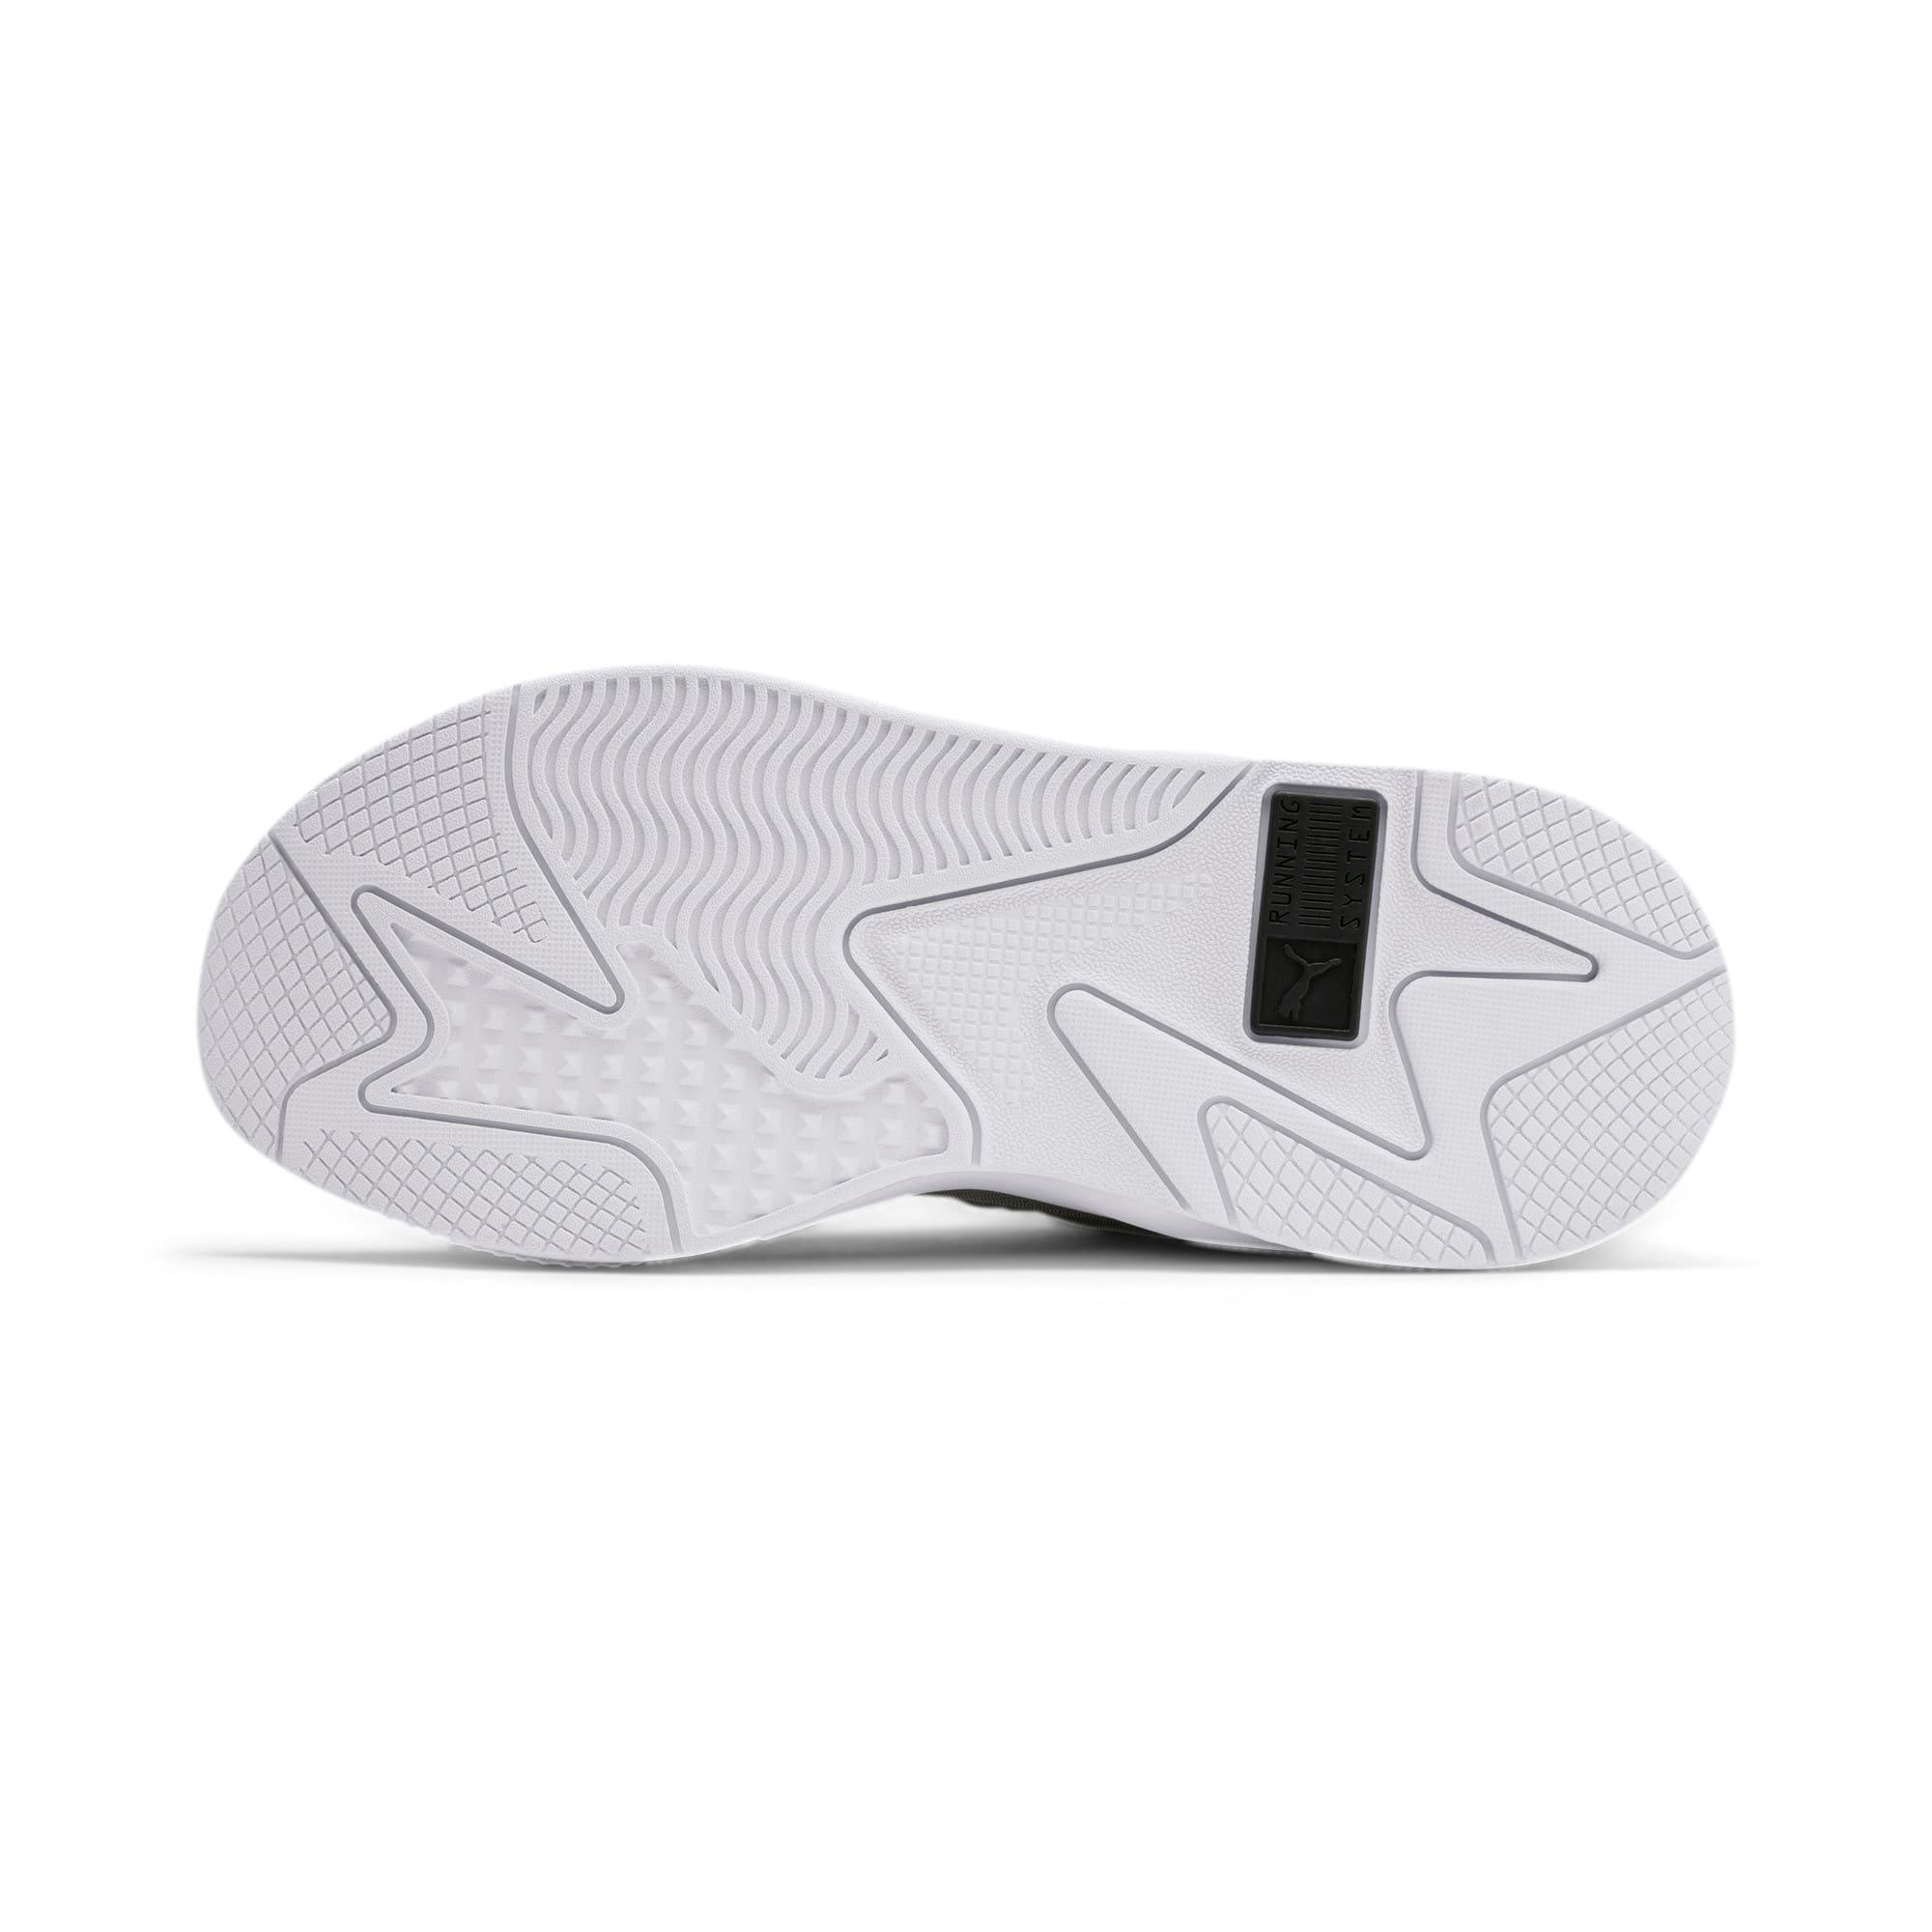 Thumbnail 5 of Basket RS-X Softcase, Puma White-High Rise, medium